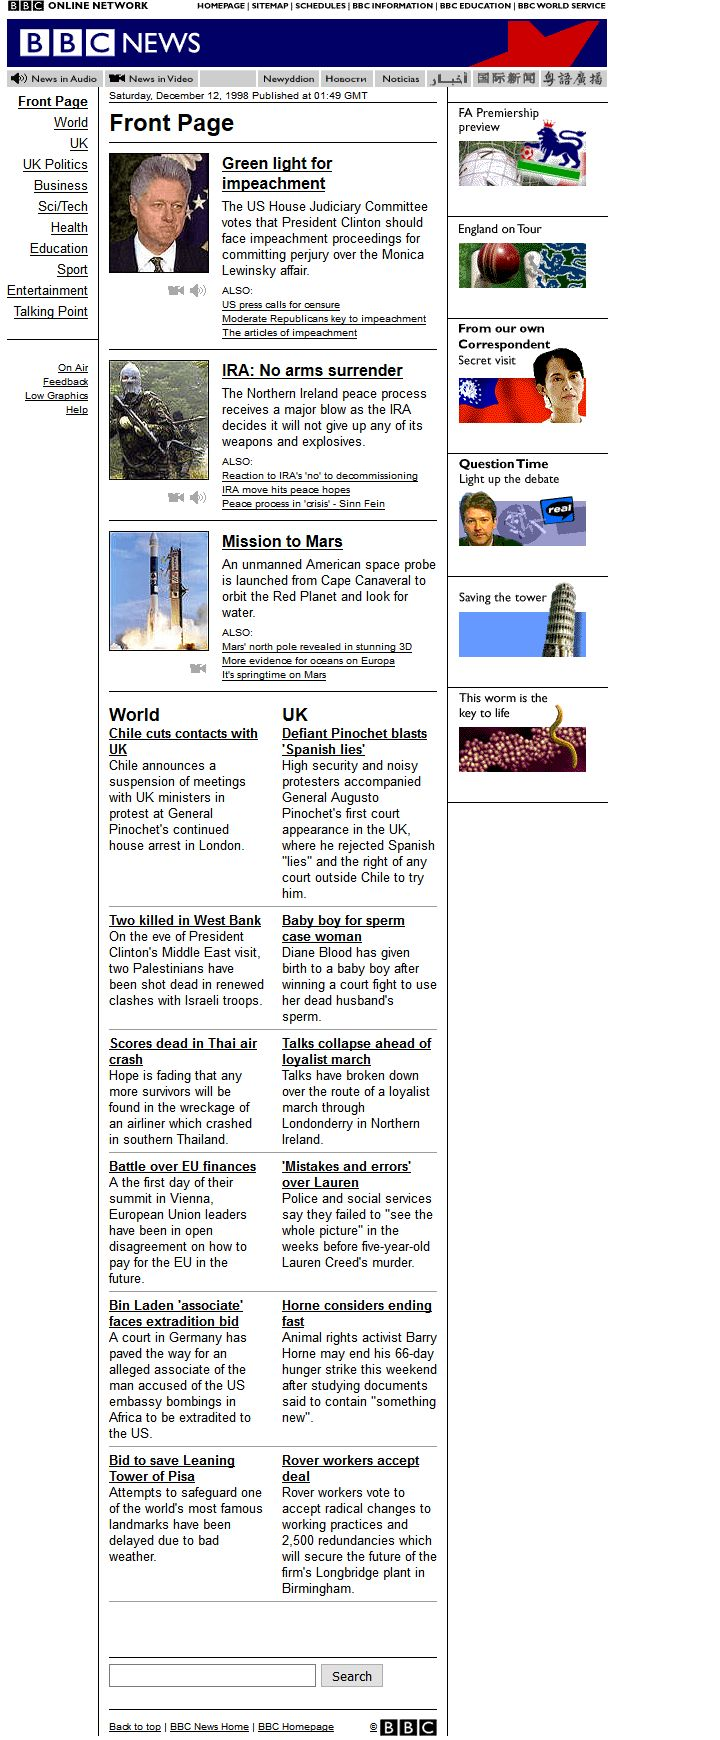 BBC News website in 1998